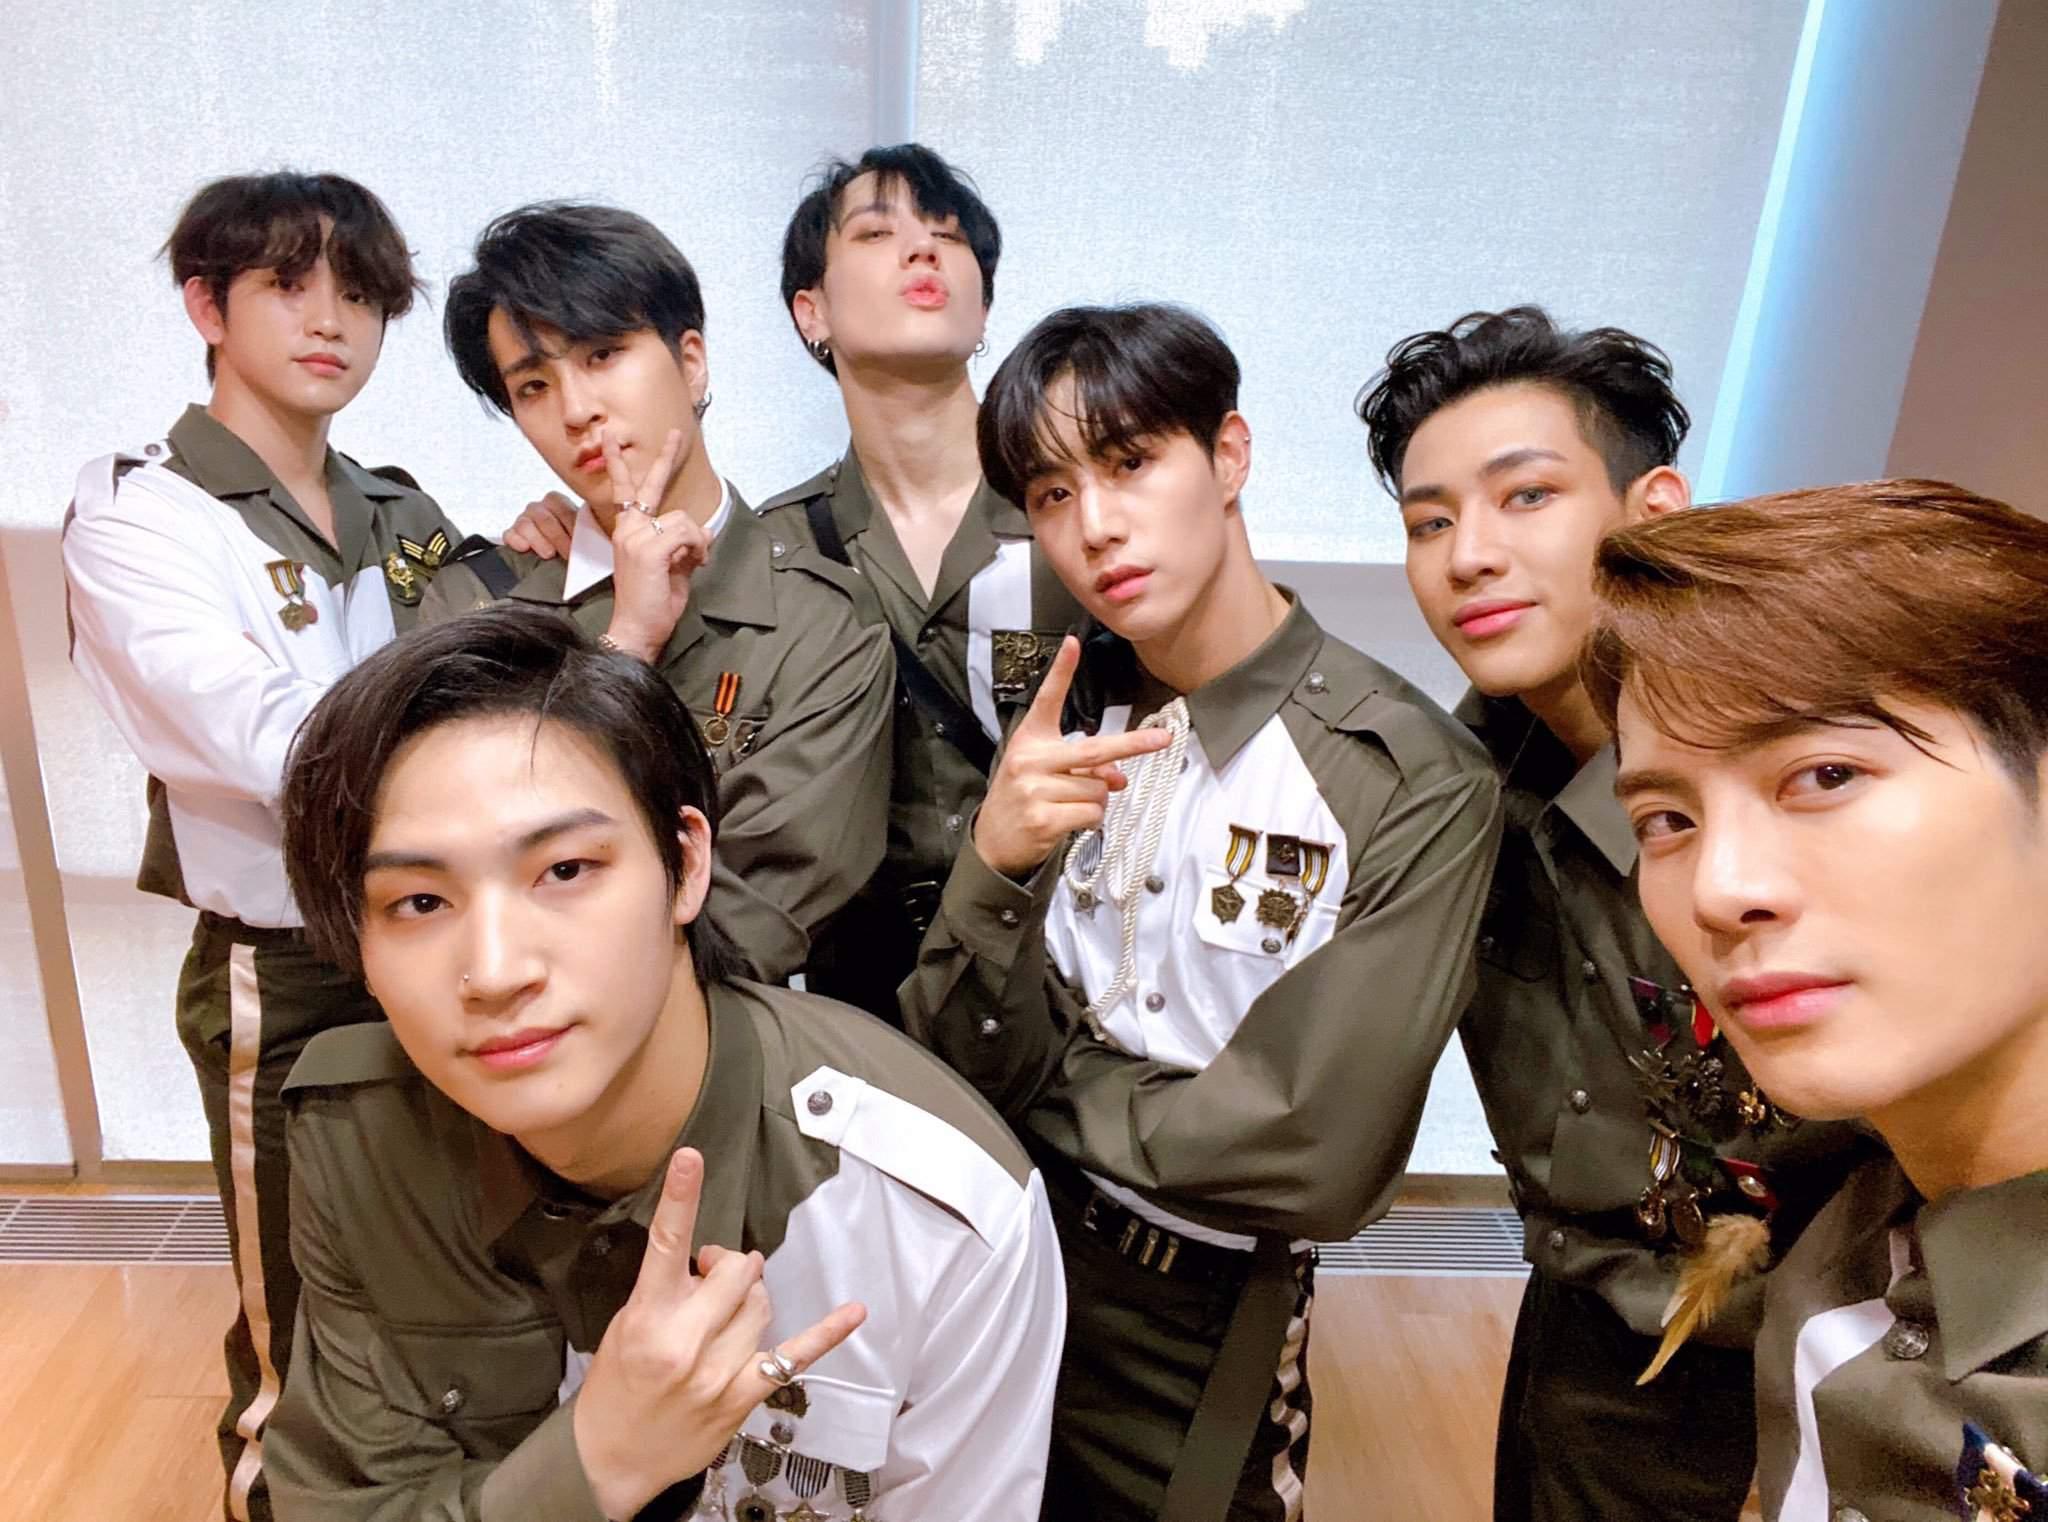 got7 jackson youngjae yugyeom mark jinyoung got update wang amino igot7 heart